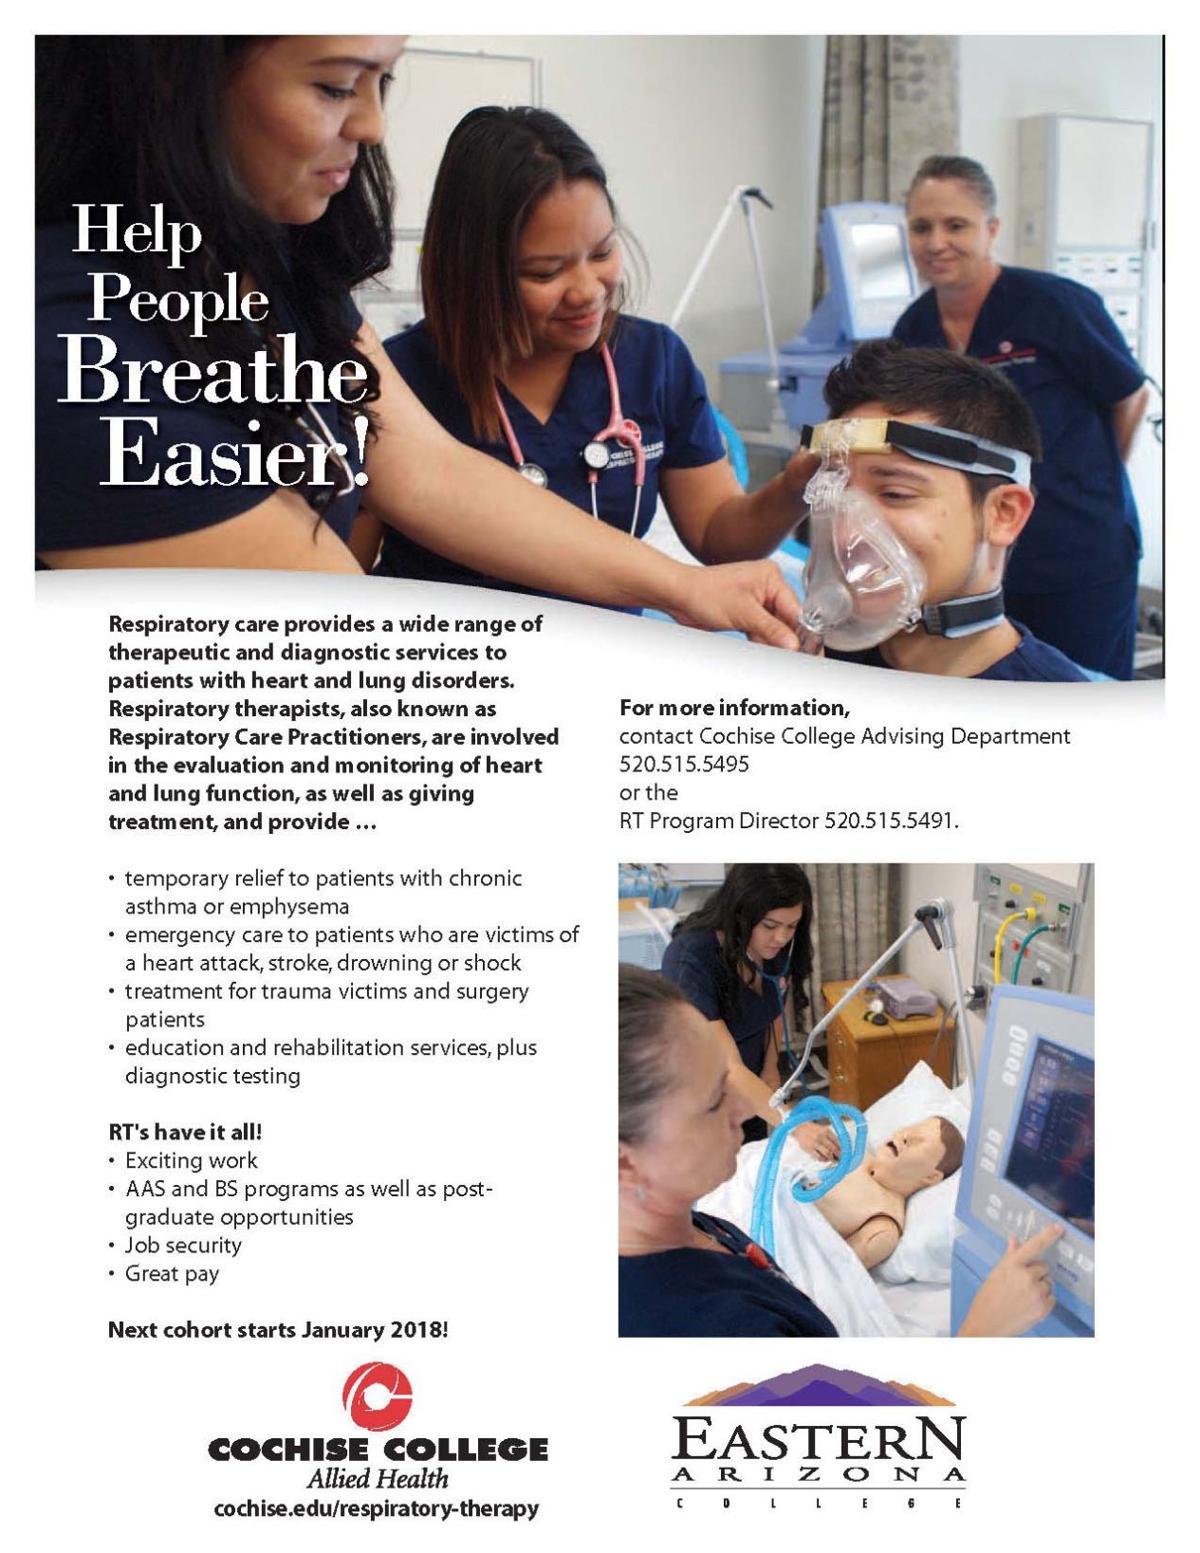 Respiratory therapist schools online programs